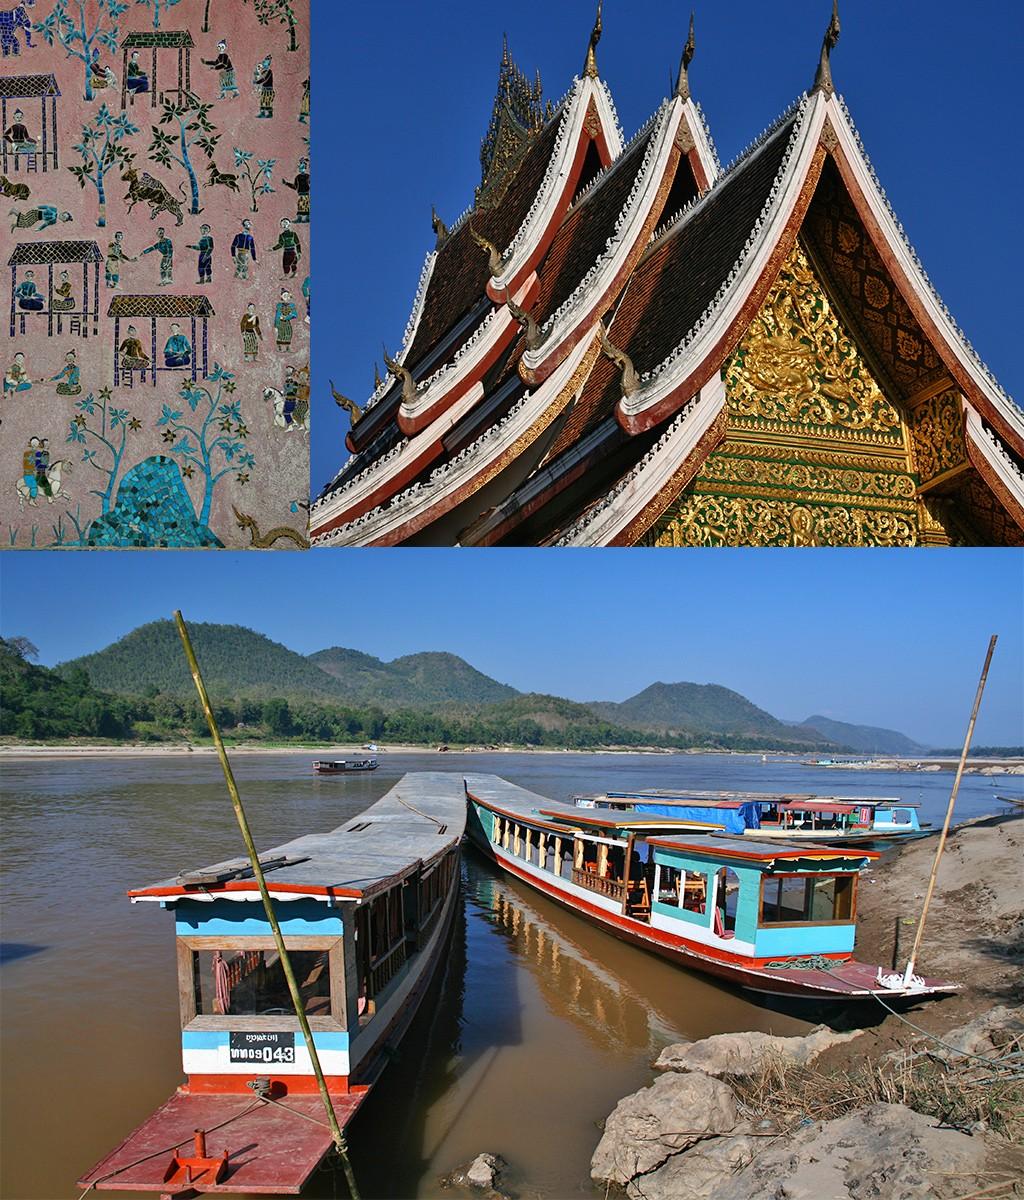 tempels en Mekong Luang Prabang